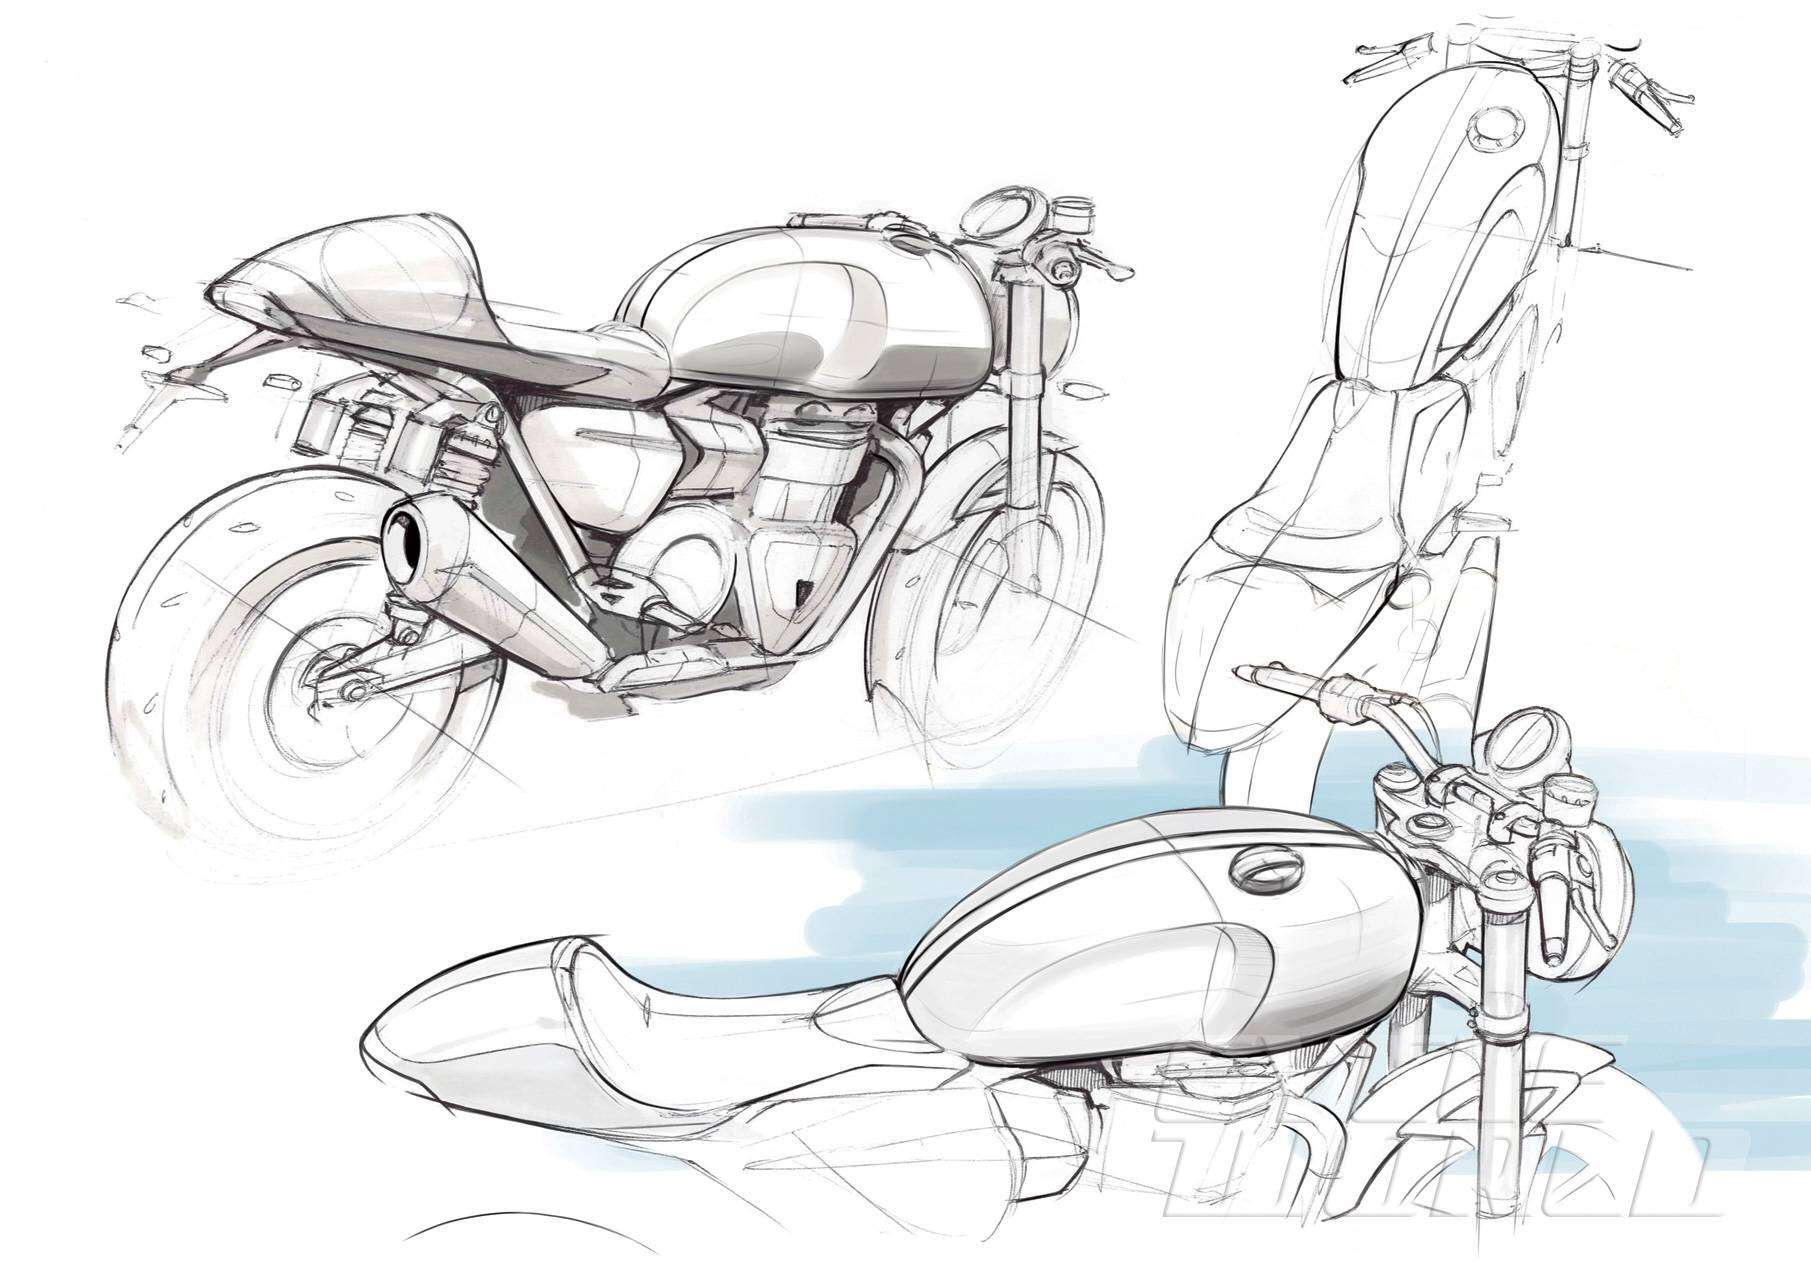 Triumph Thruxton et ThruxtonR  - Page 2 Image59